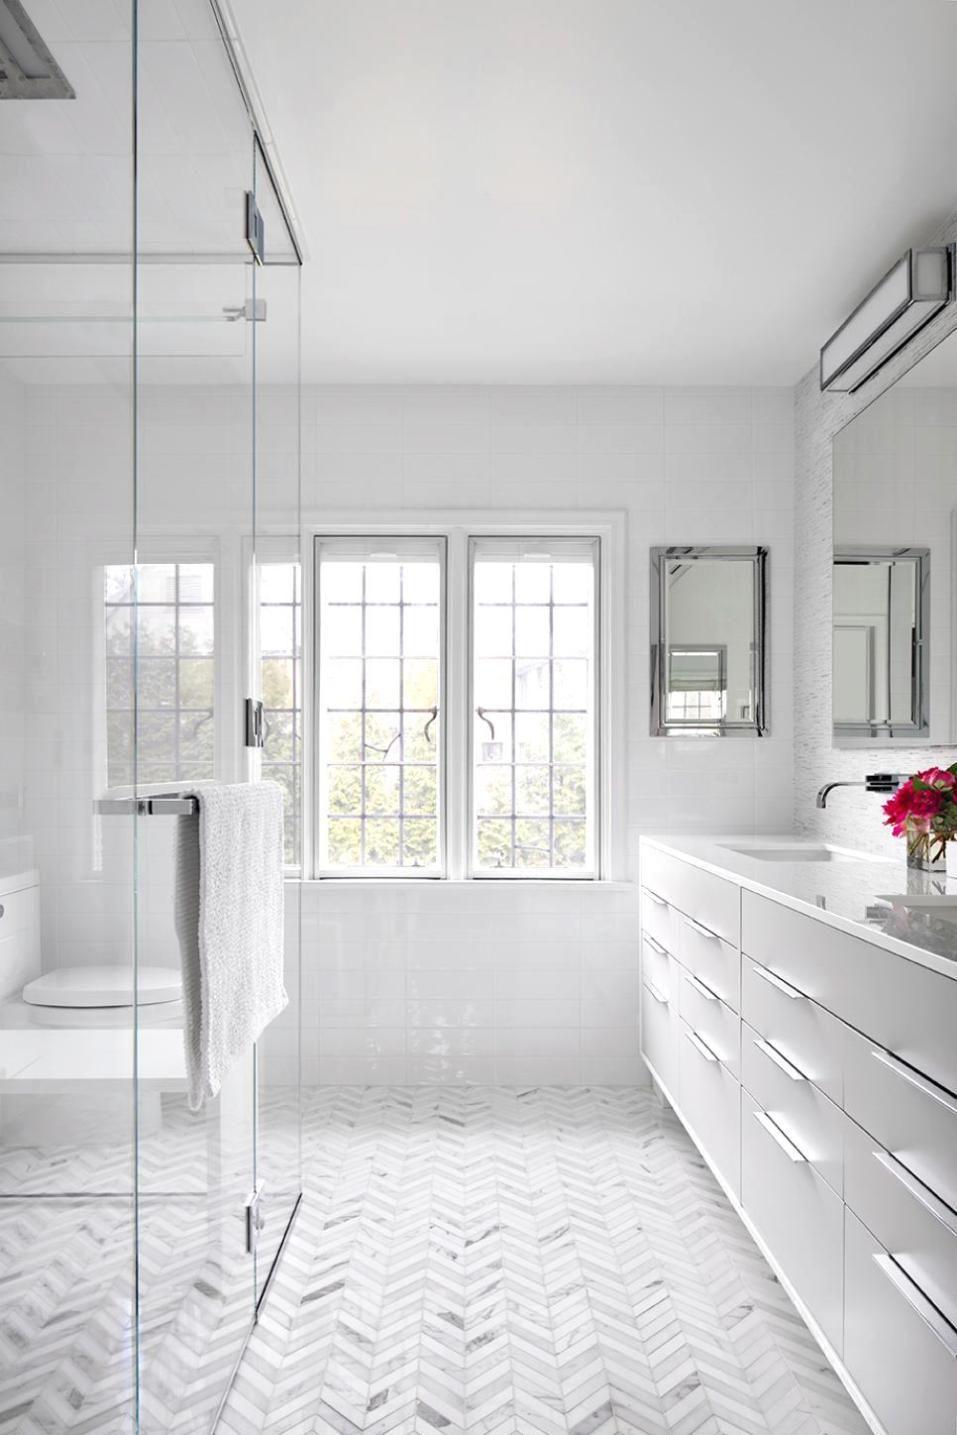 11 Bright White Bathrooms   Design Ideas / Inspiration   Pinterest ...